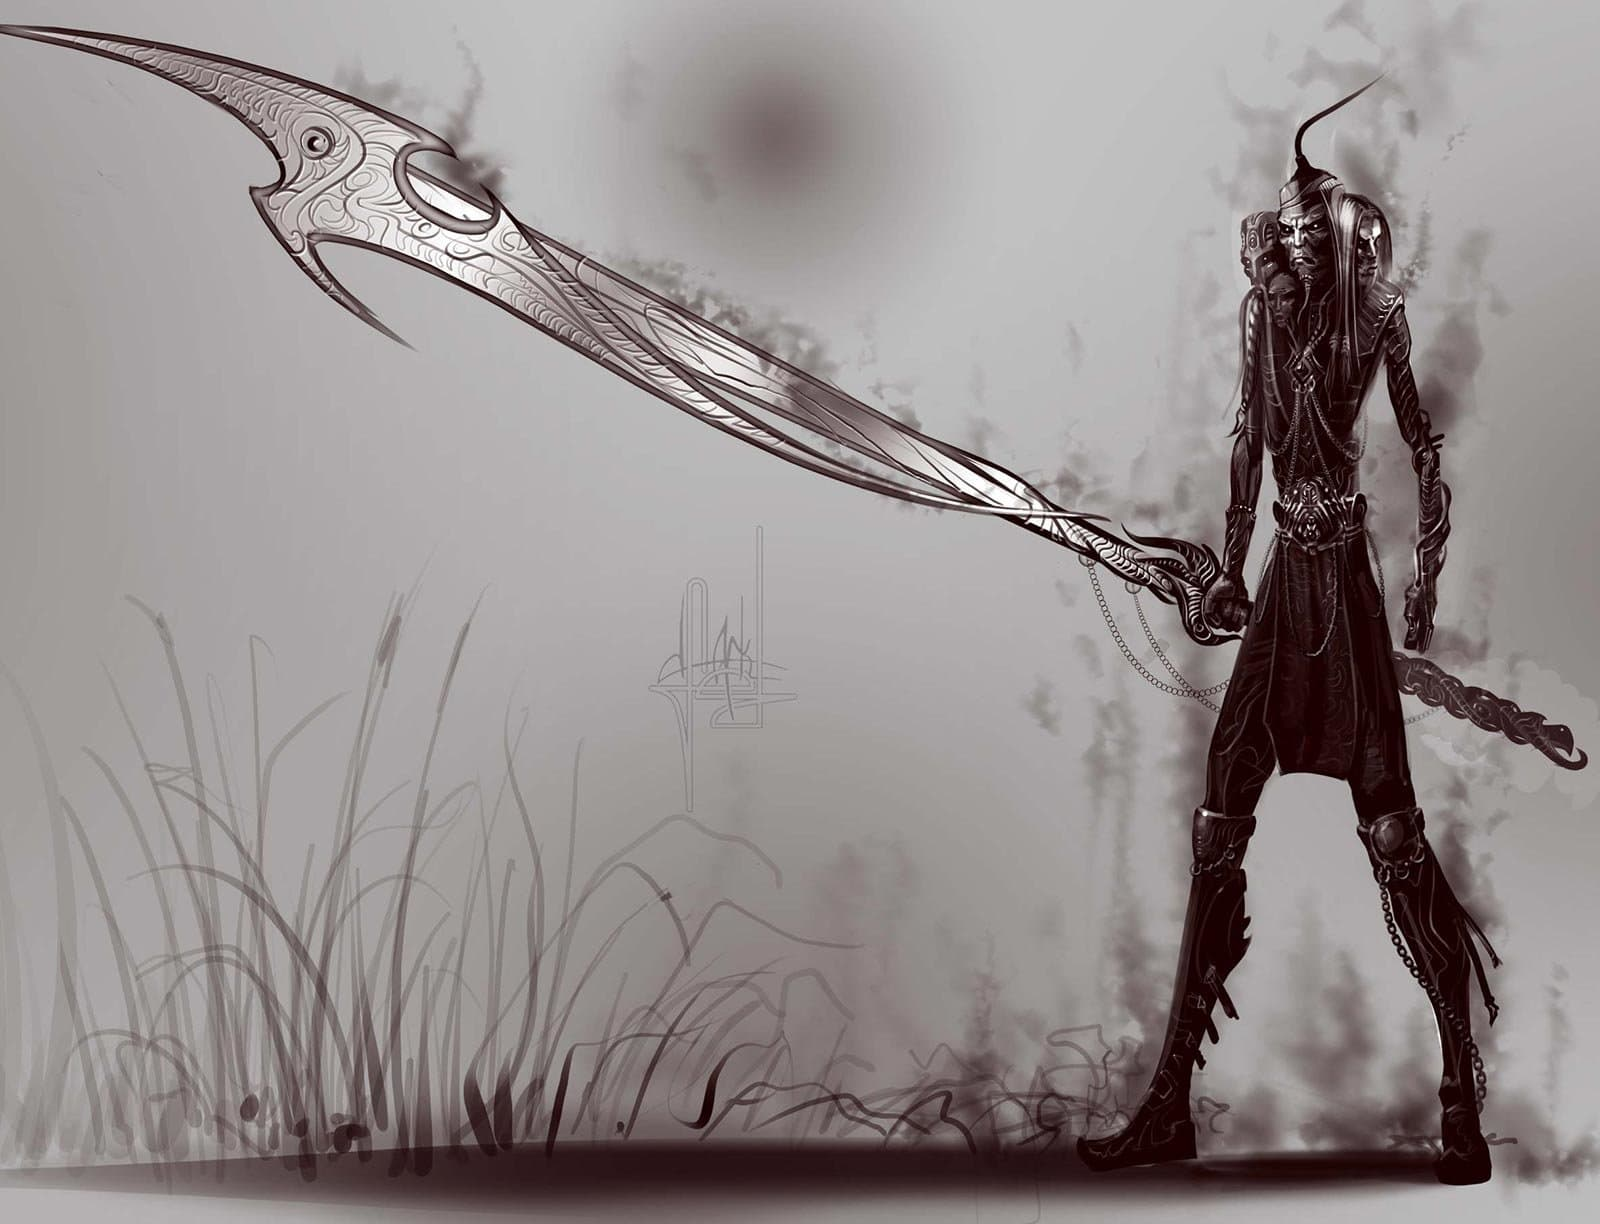 бездушный воин